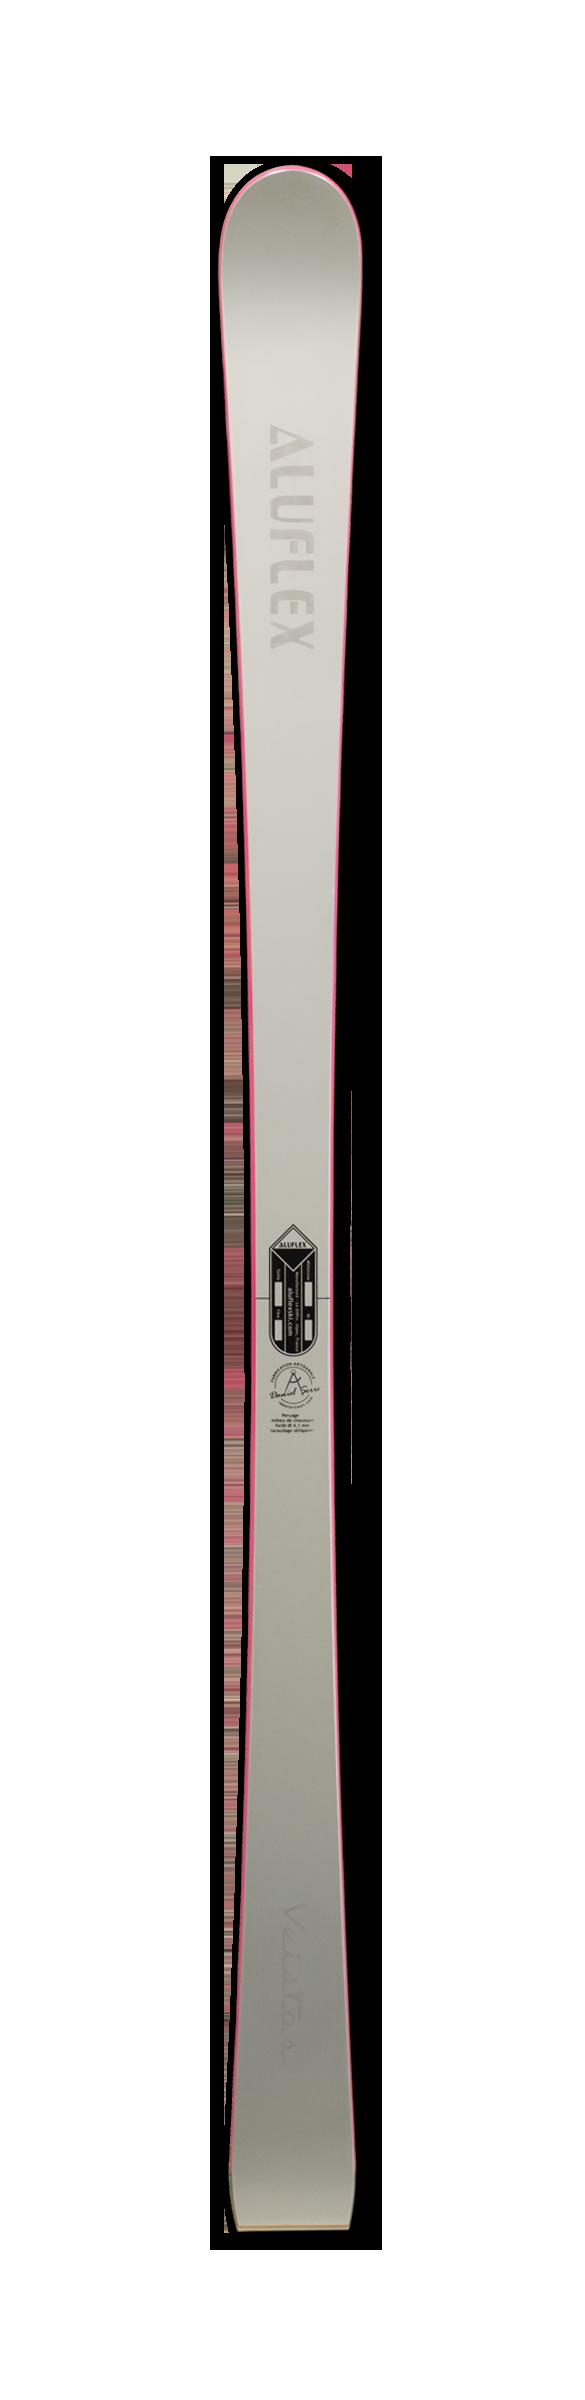 Ski Aluflex Veistos